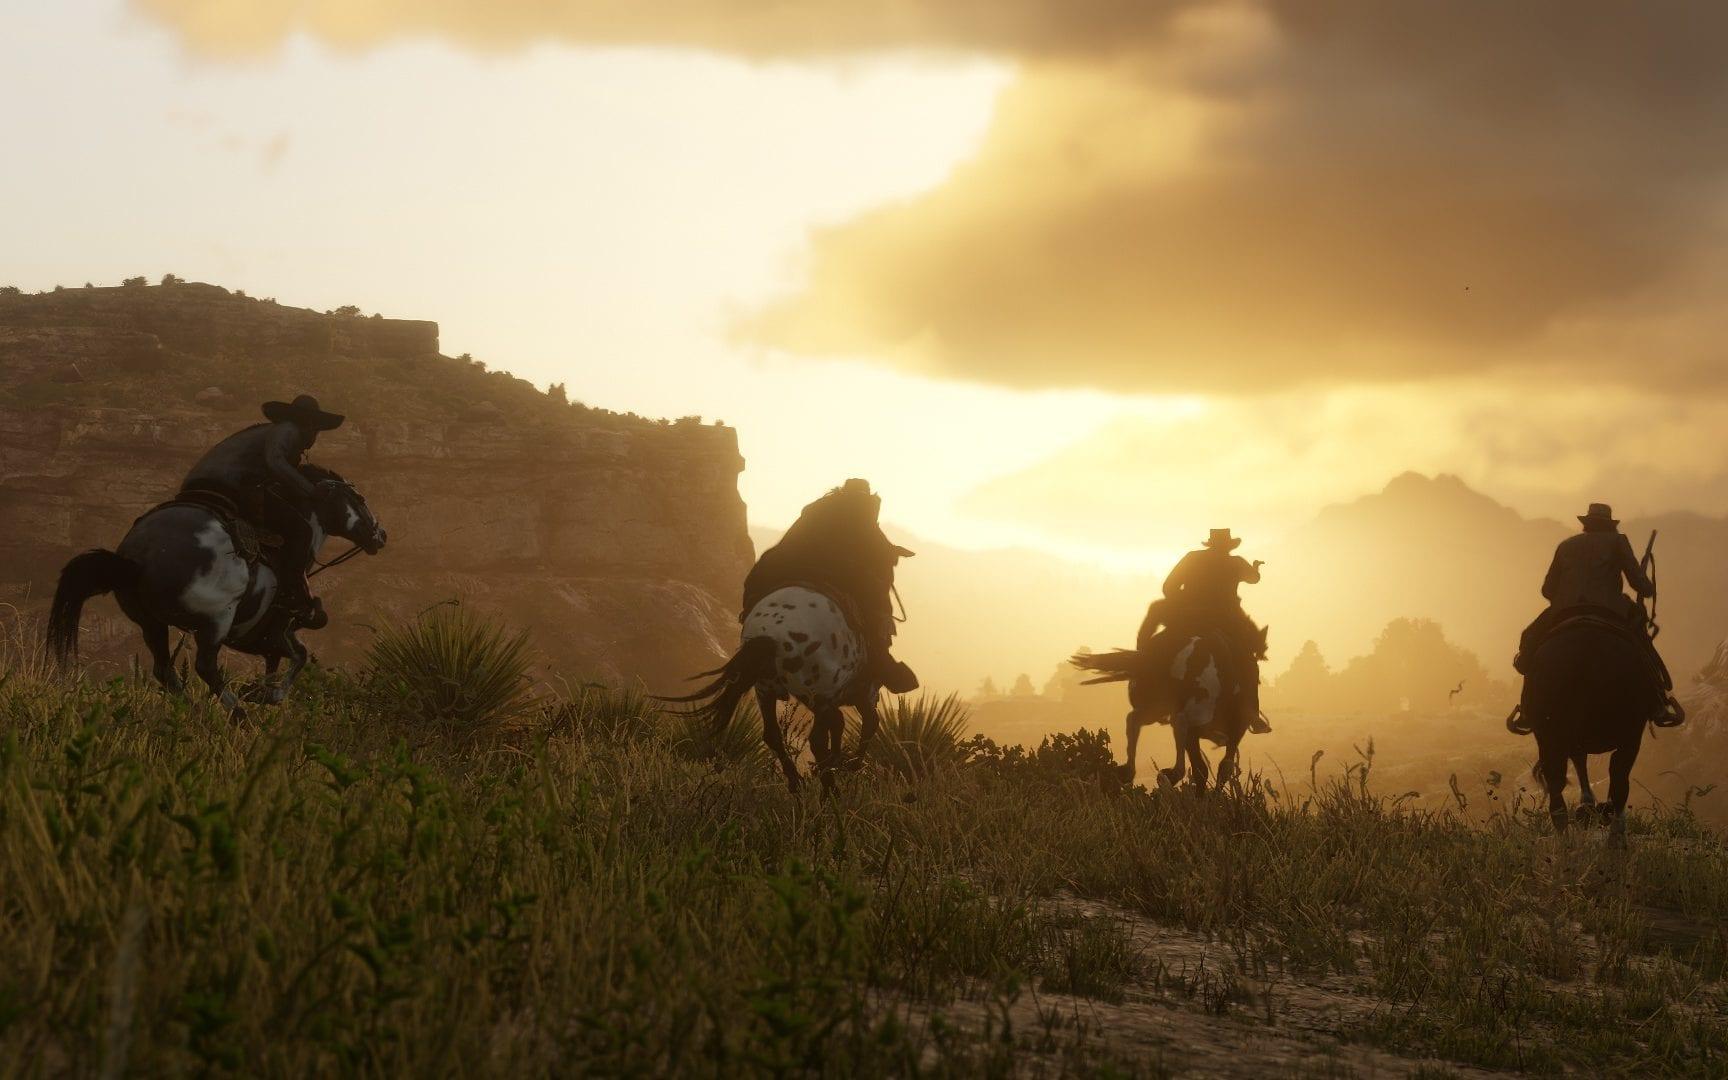 Red Dead Redemption 2 پرجزئیاتترین و باورپذیرترین جهانبازی است که راکاستار ساخته است